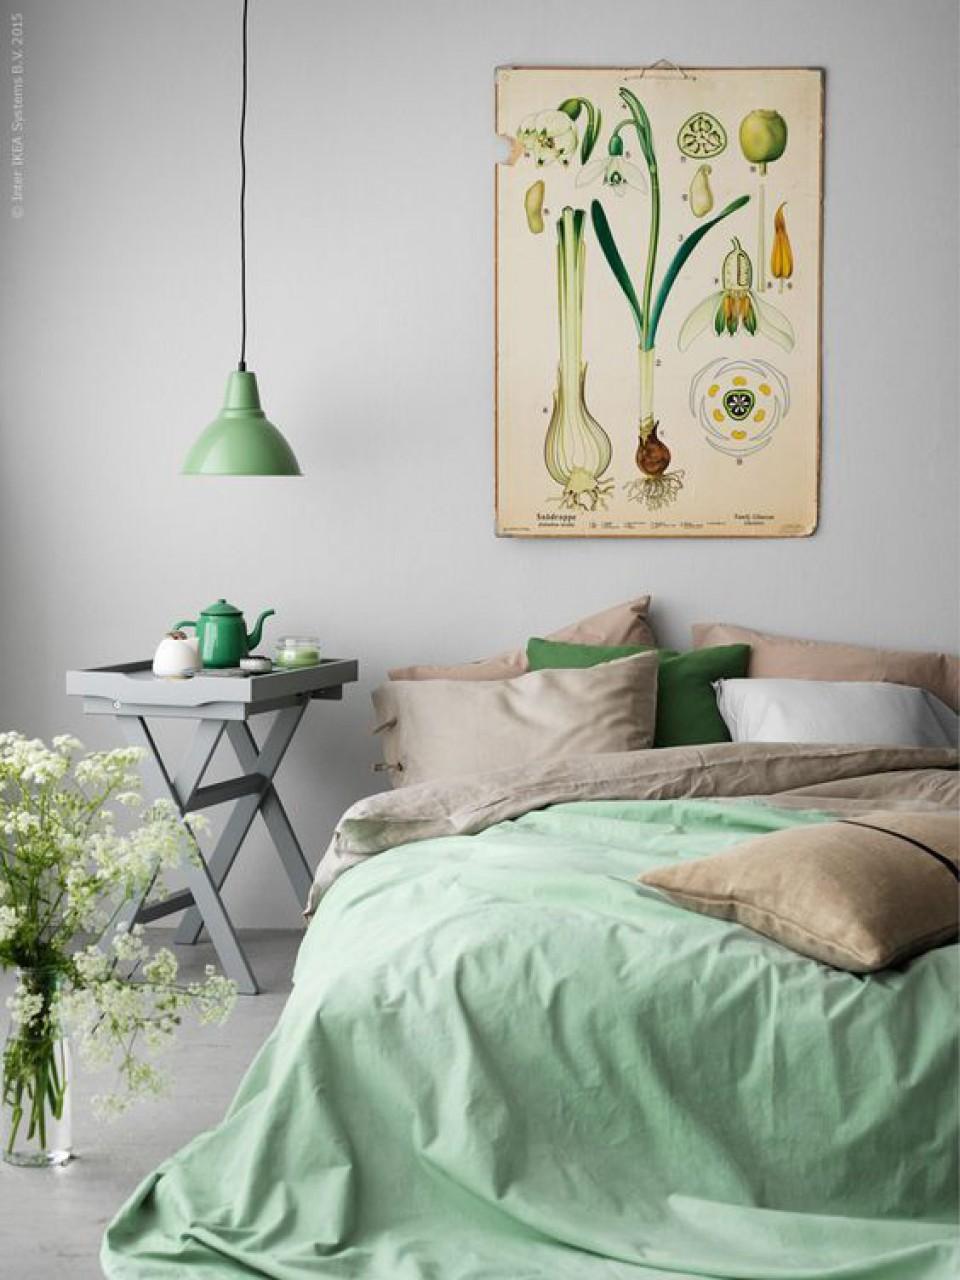 Berbagai Kamar Tidur Dengan Warna Pastel Yang Cantik Dan